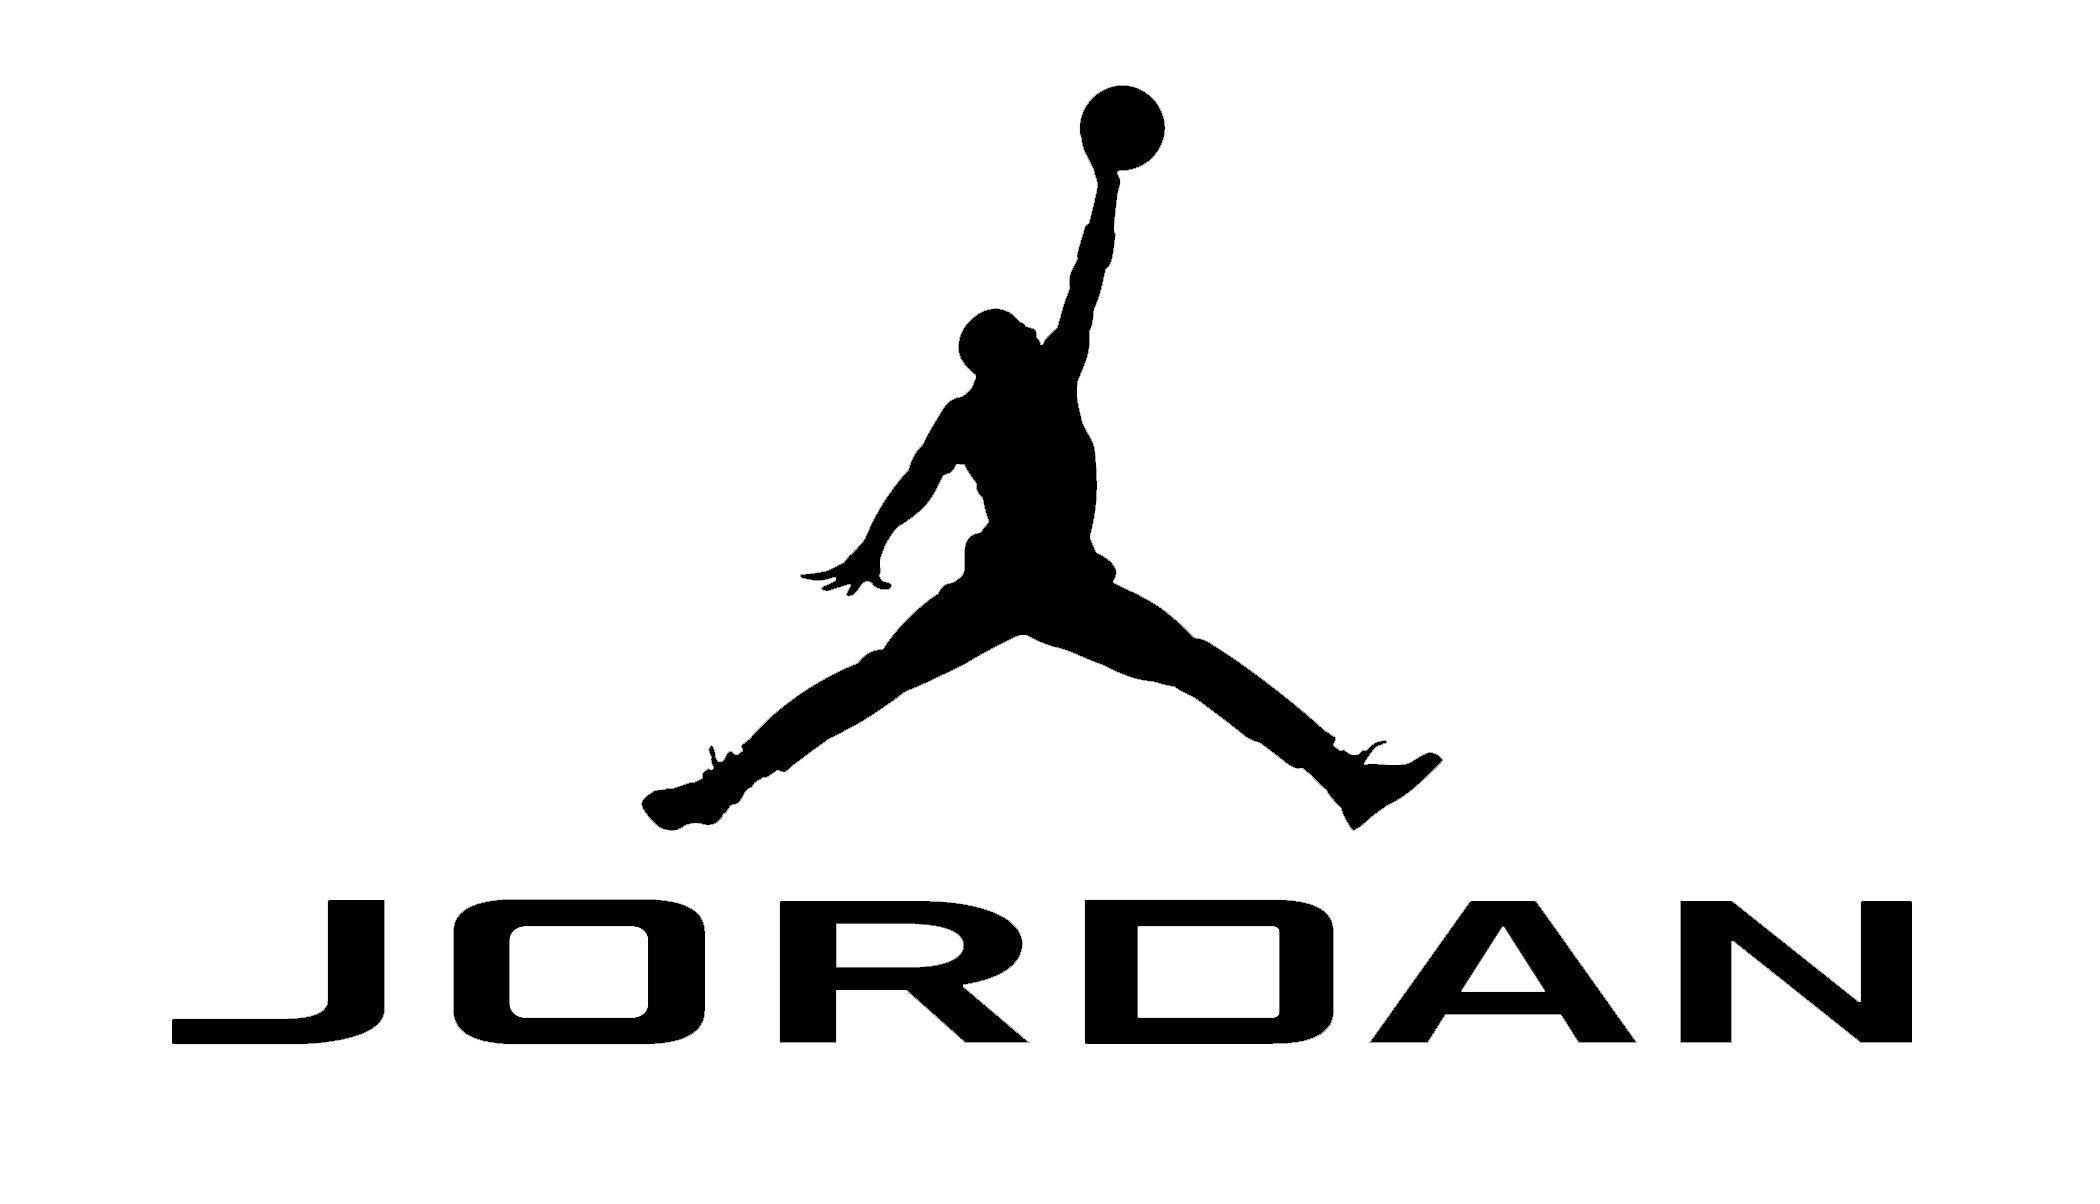 ¿Qué significa NBA?